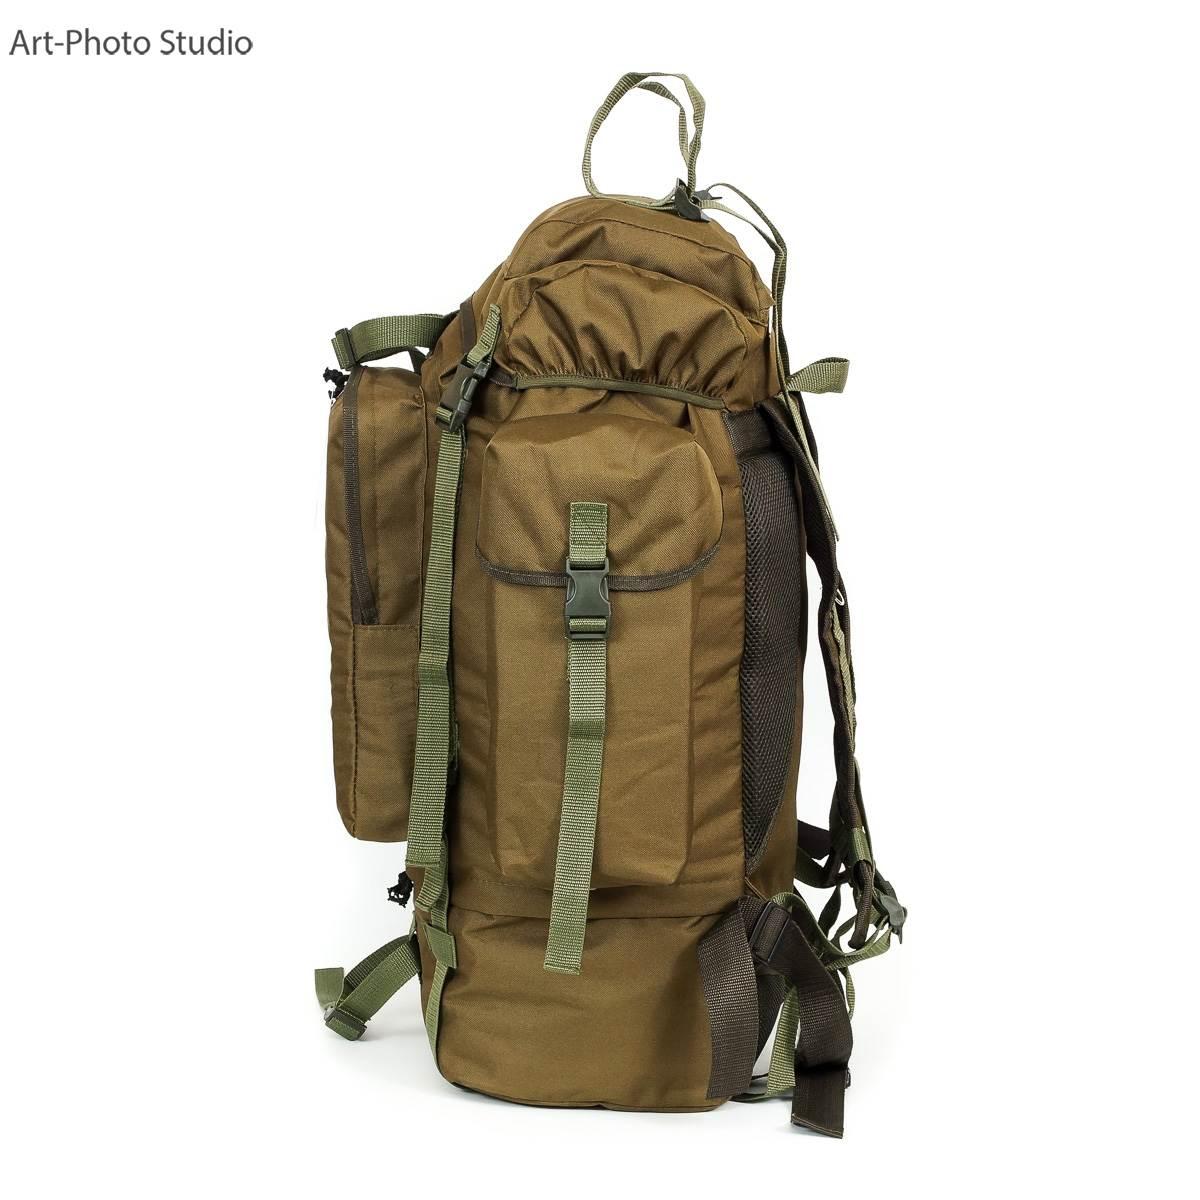 фотография туристического рюкзака цвета койот